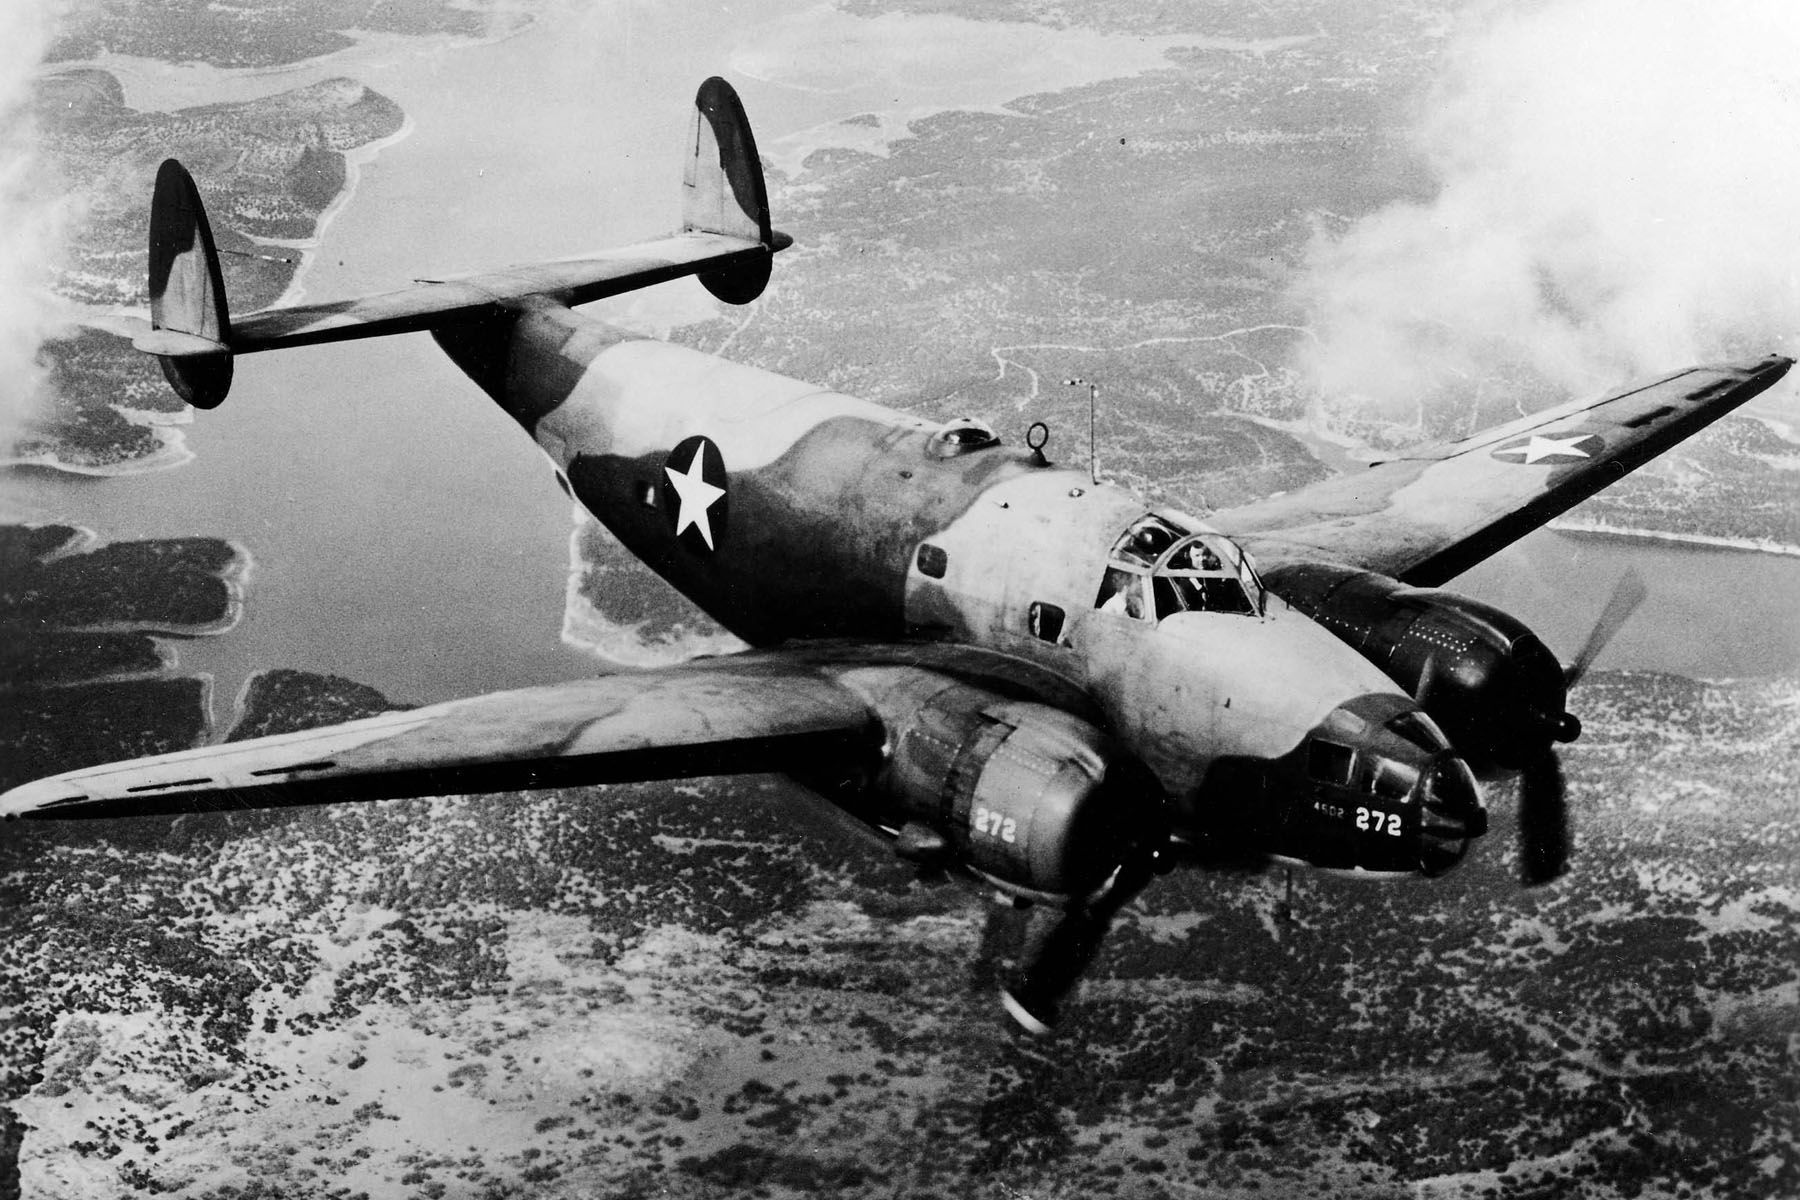 Lockheed B-34 USAAF in flight - Lockheed Ventura - Wikipedia, the free encyclopedia